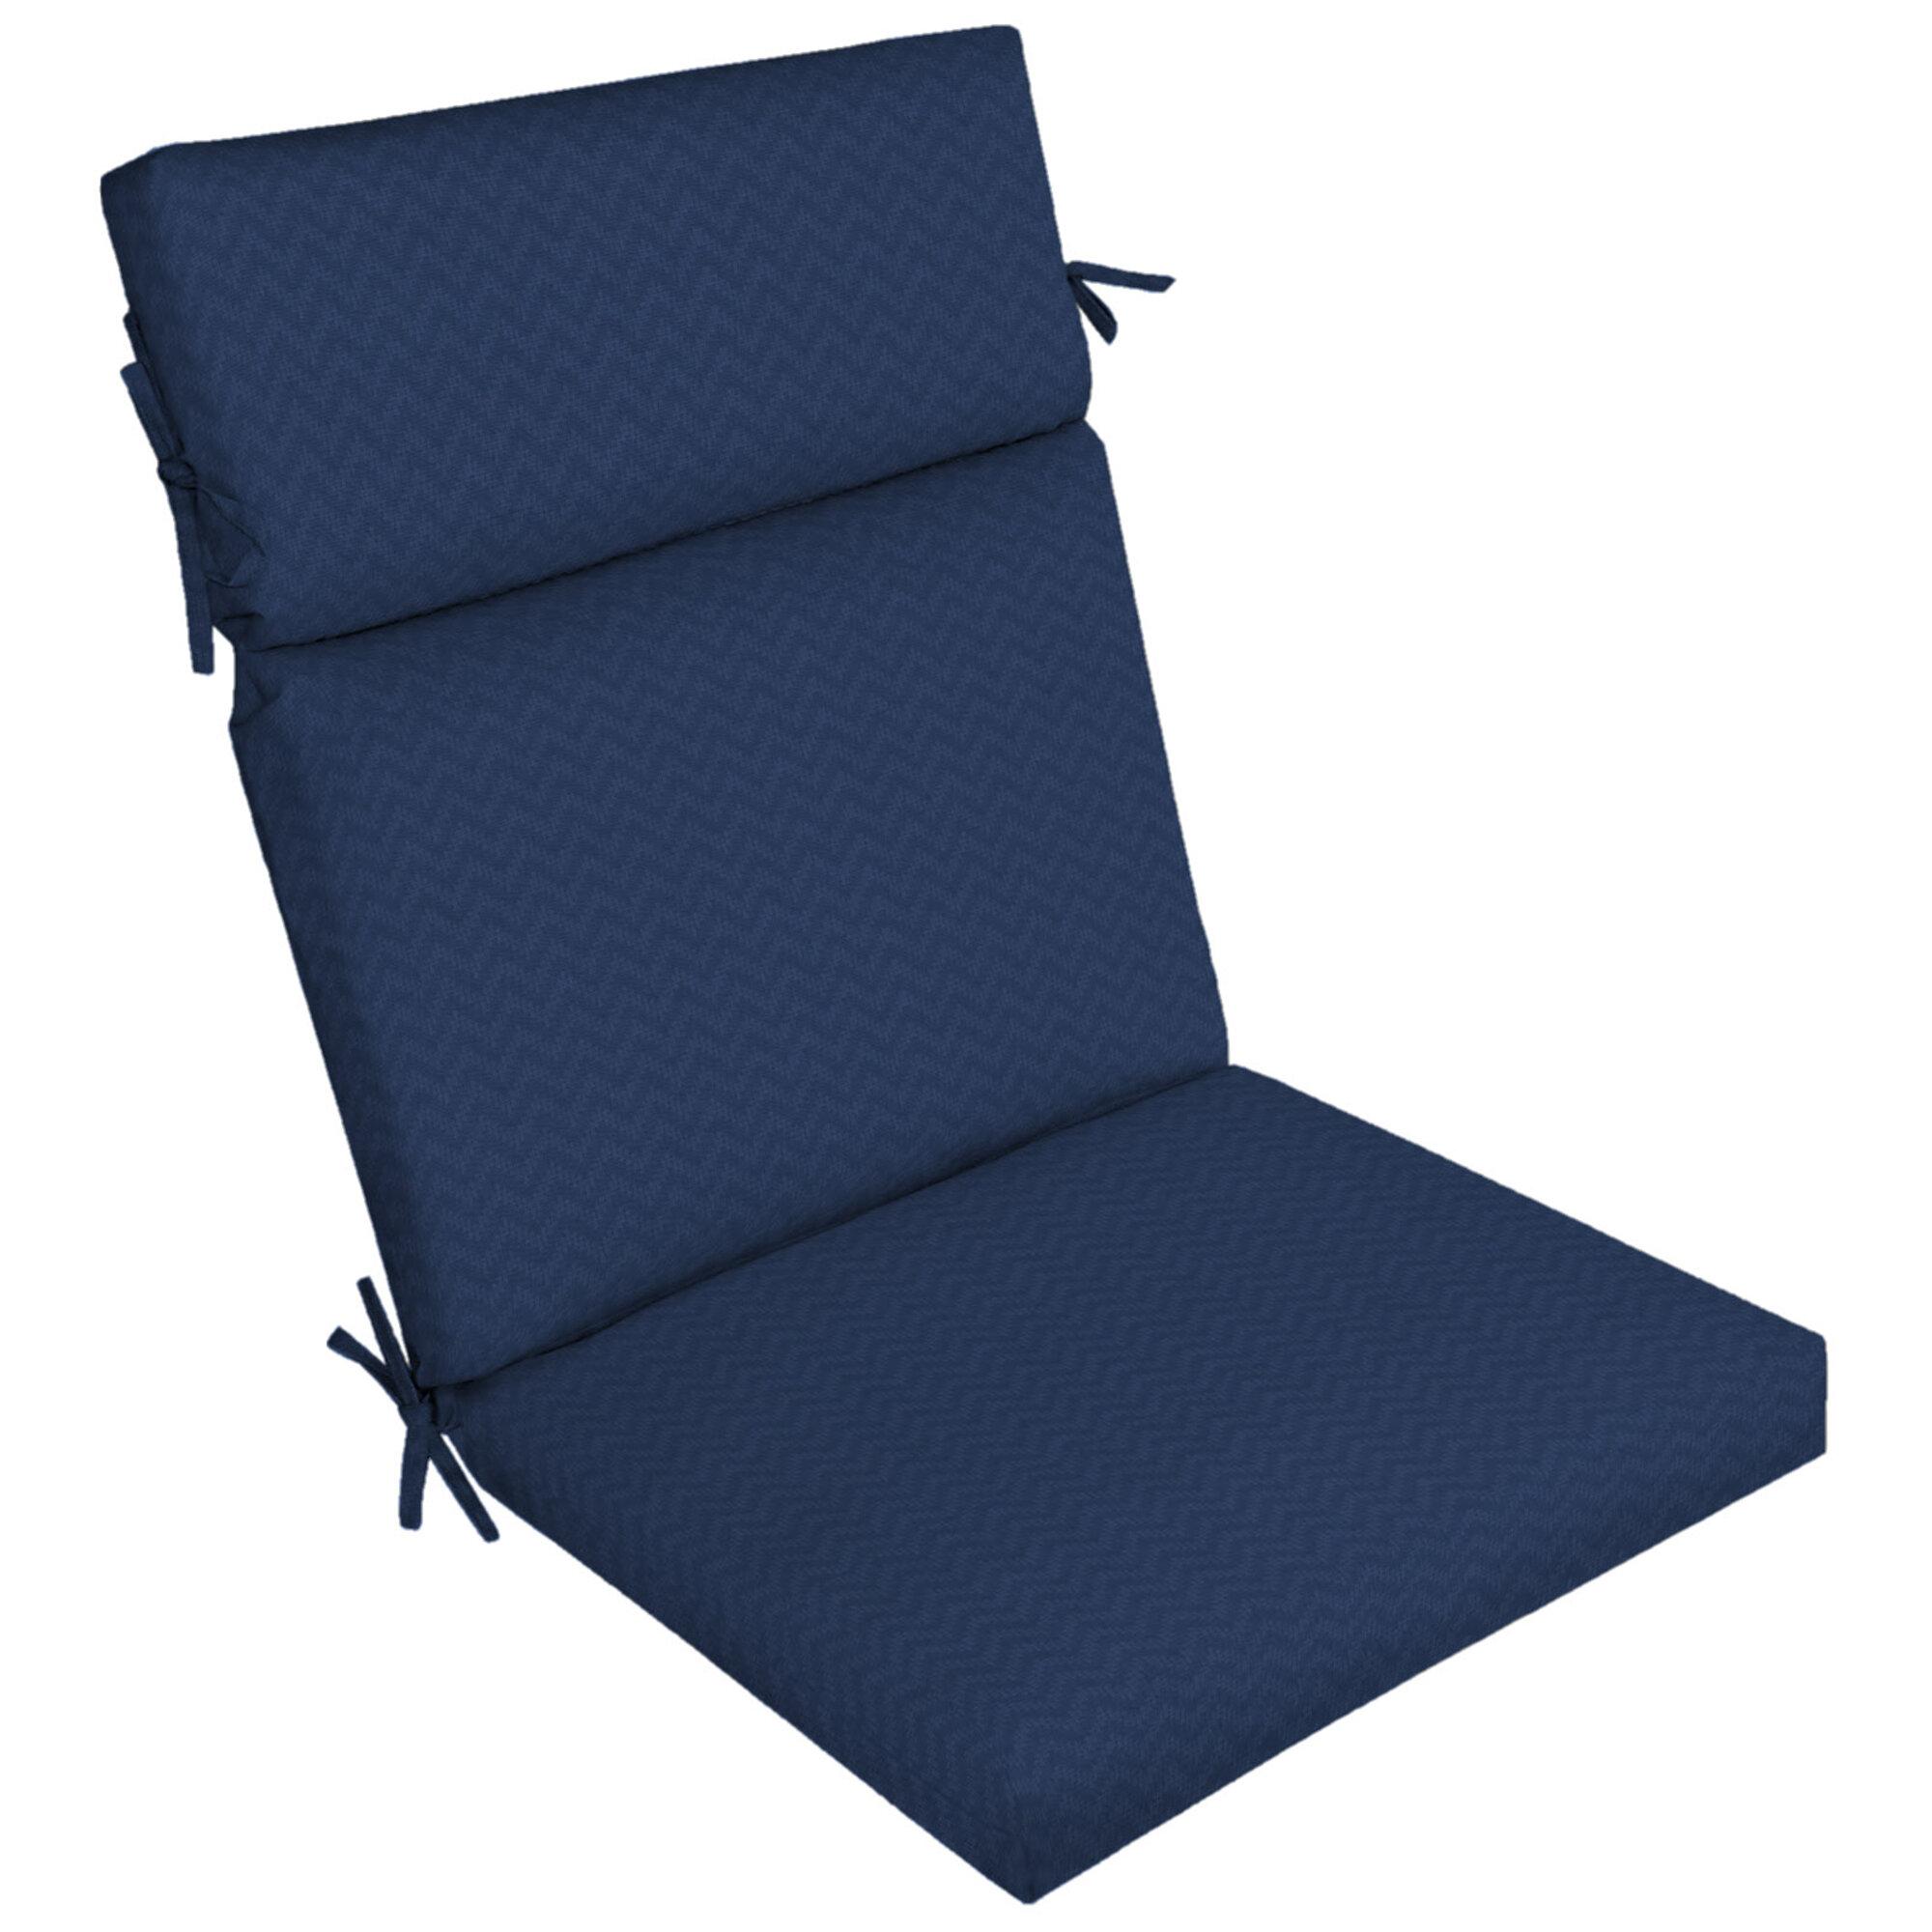 Leala High Back Outdoor Dining Chair Cushion